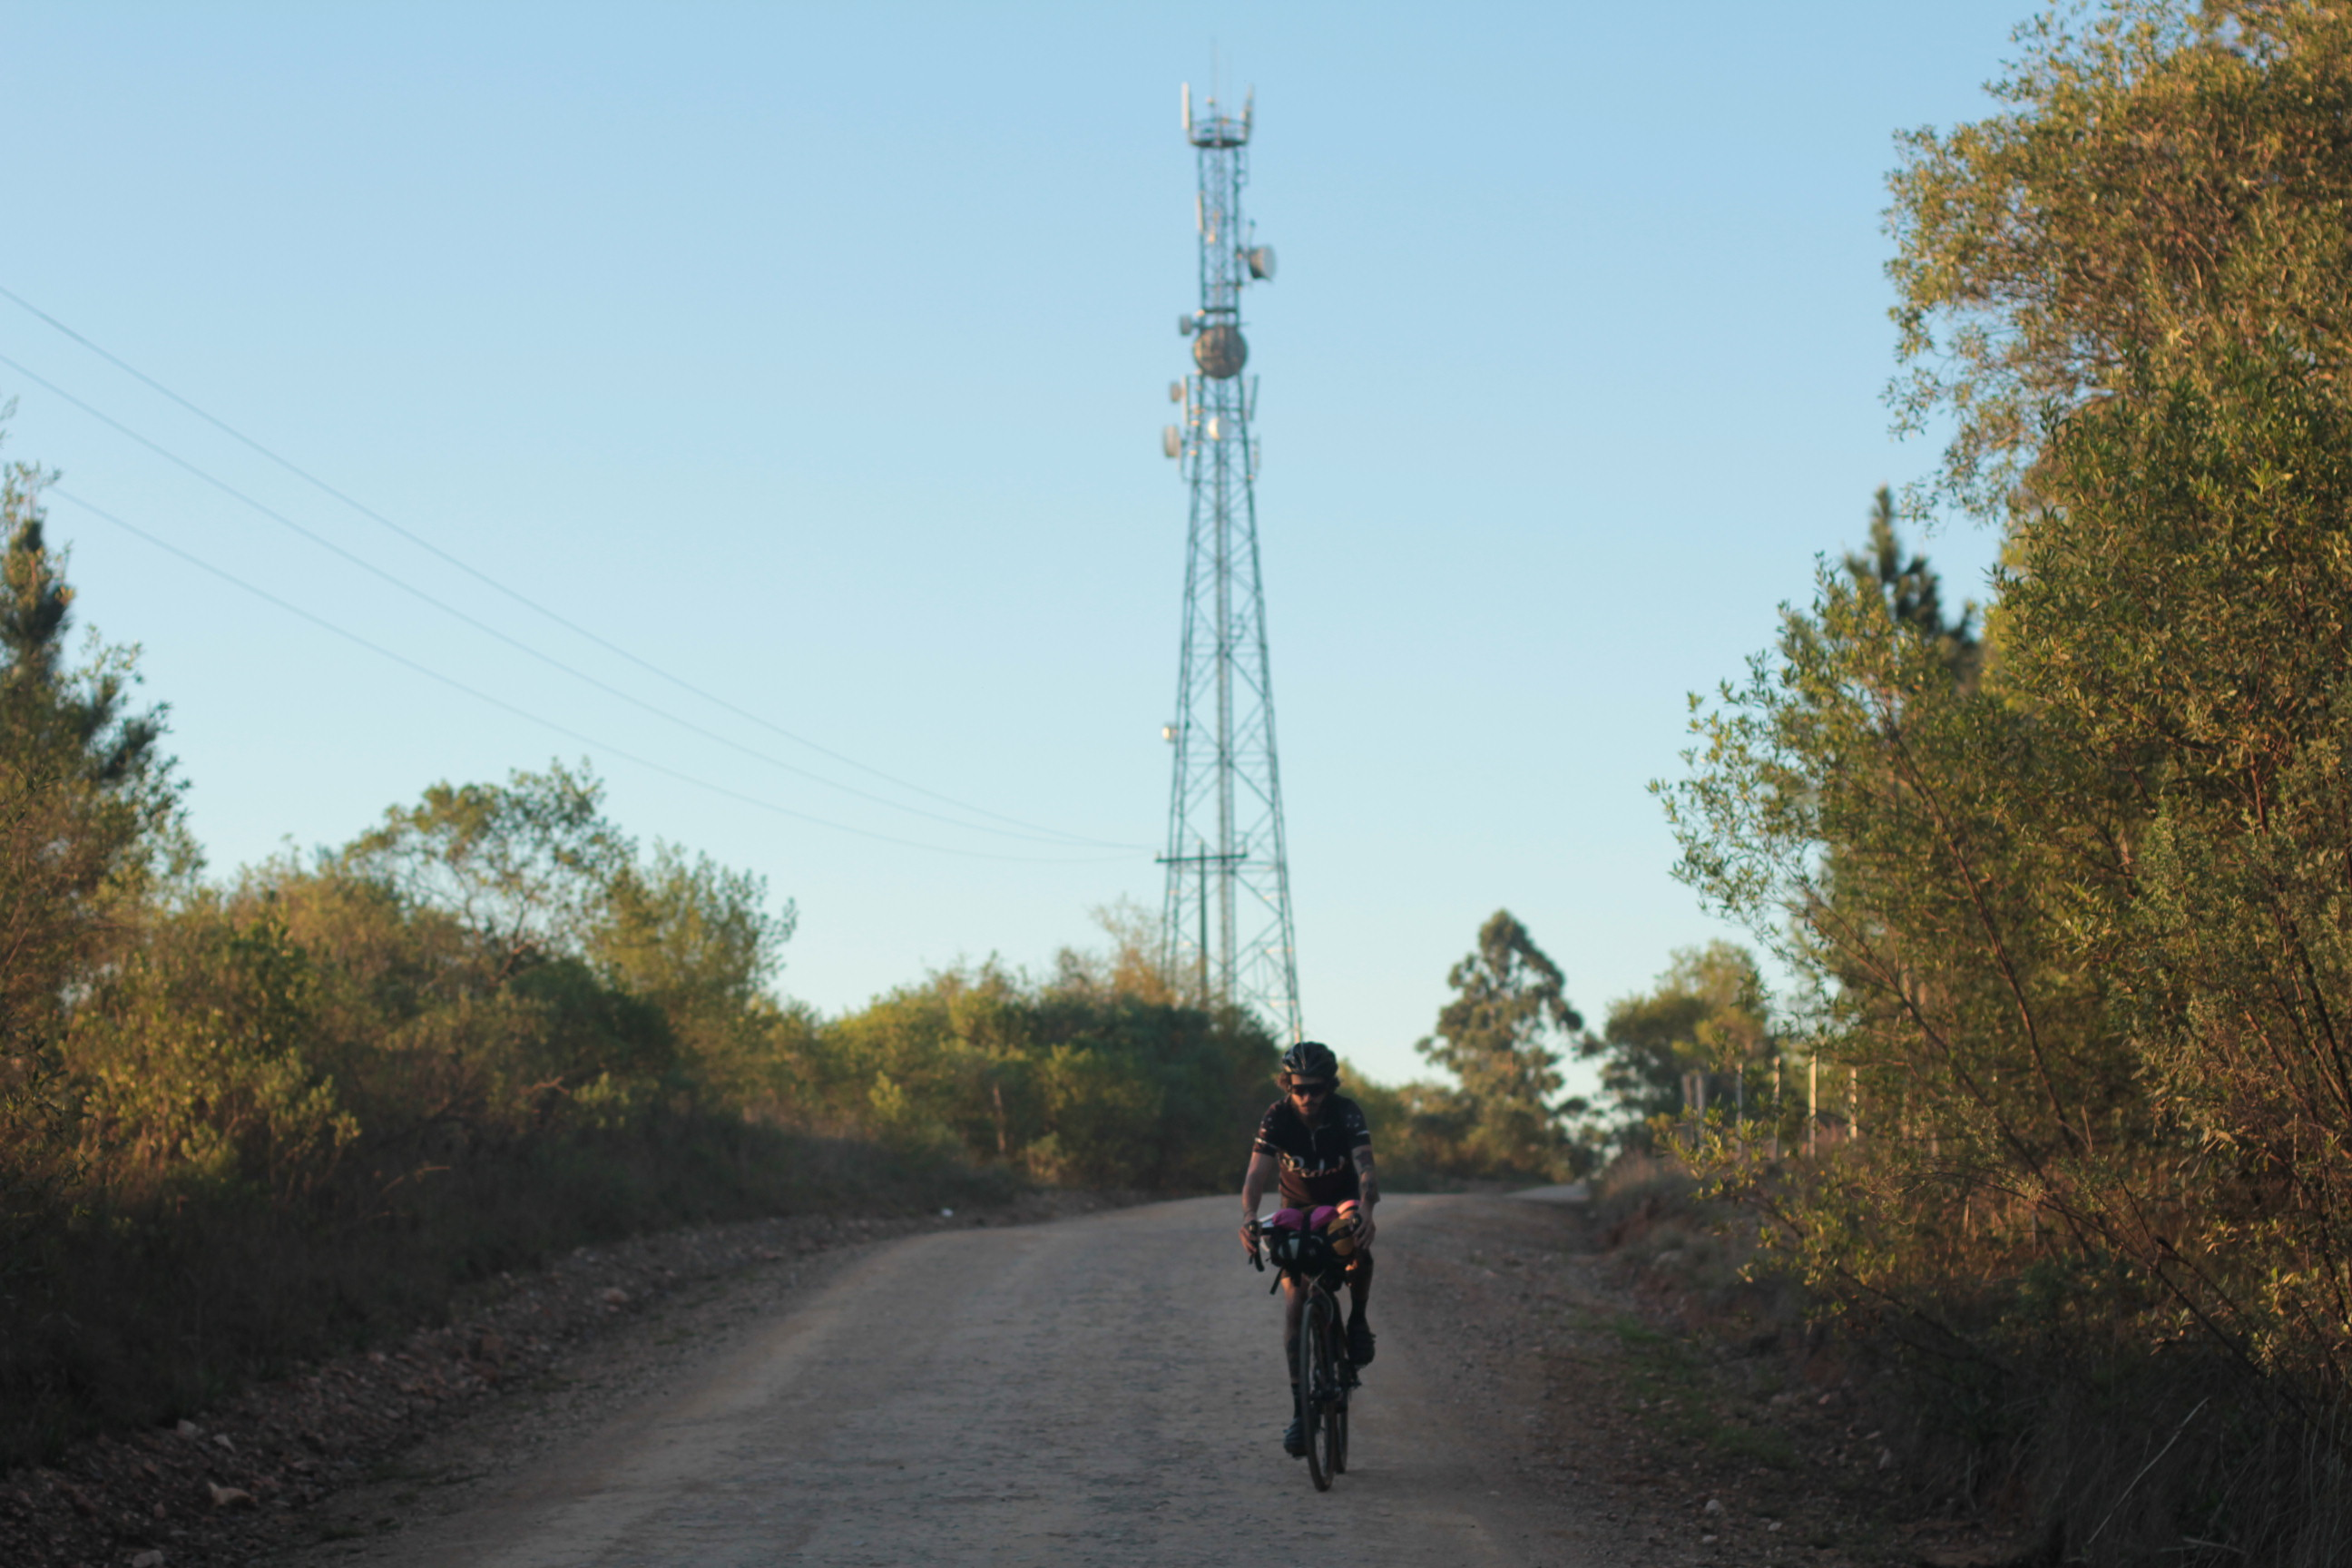 10-expresso-patagonia-porto-alegre-sao-gabriel-bike-packing